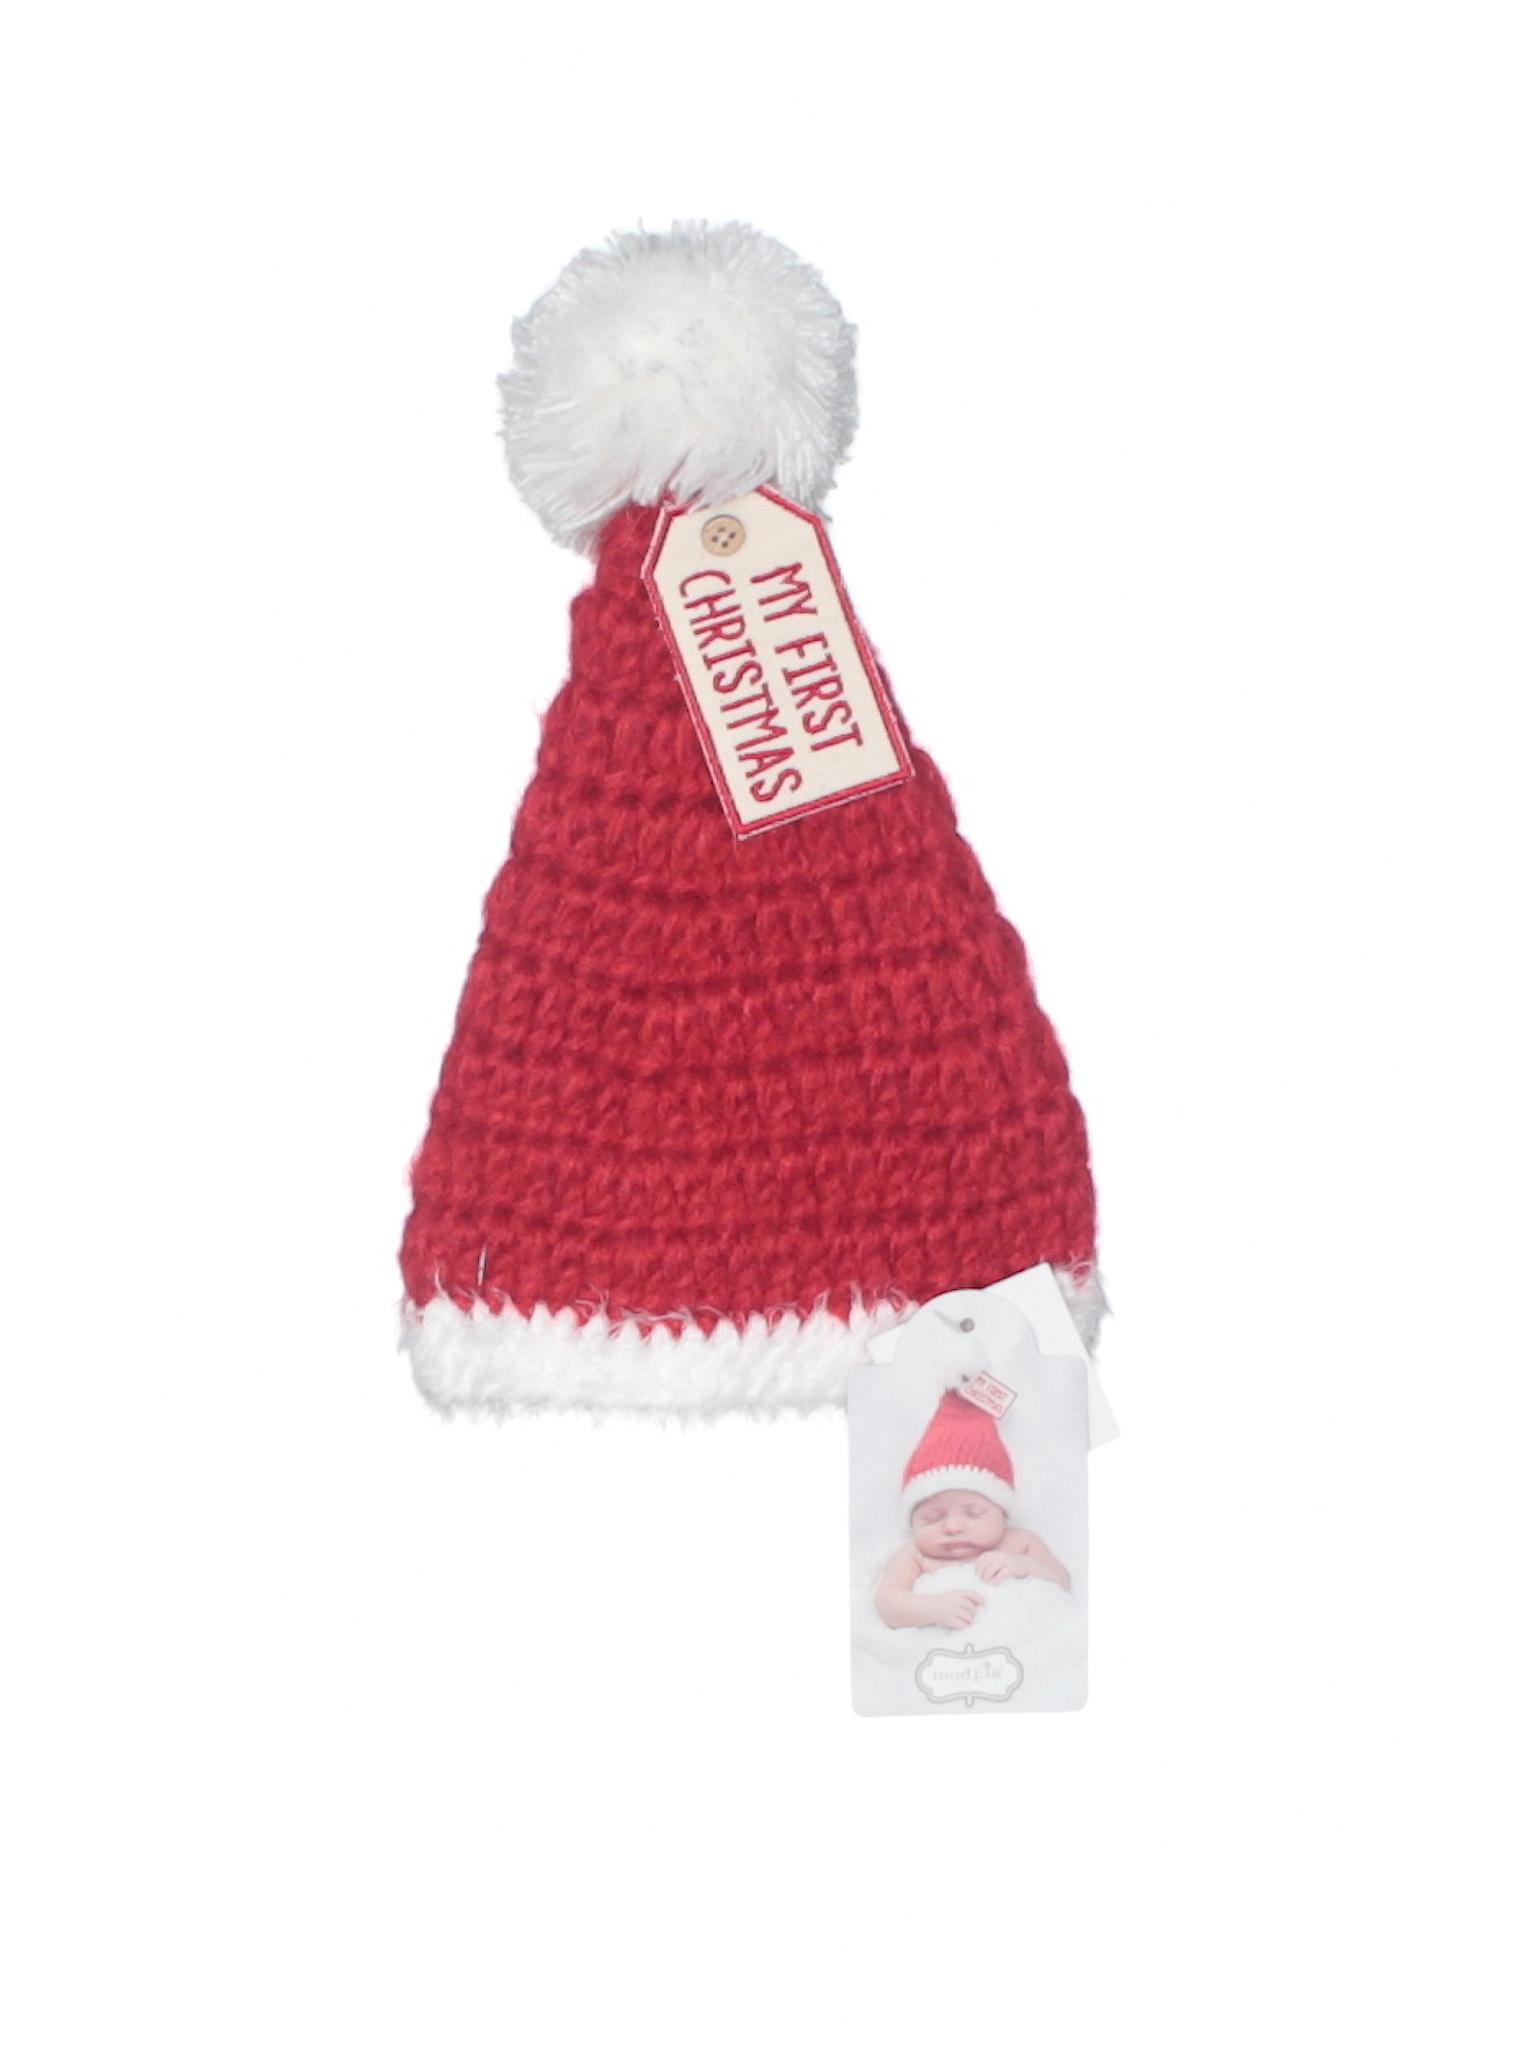 96f7740d62e5ee Mud Pie 100% Acrylic Crochet Red Beanie Size 0-3 mo - 42% off | thredUP